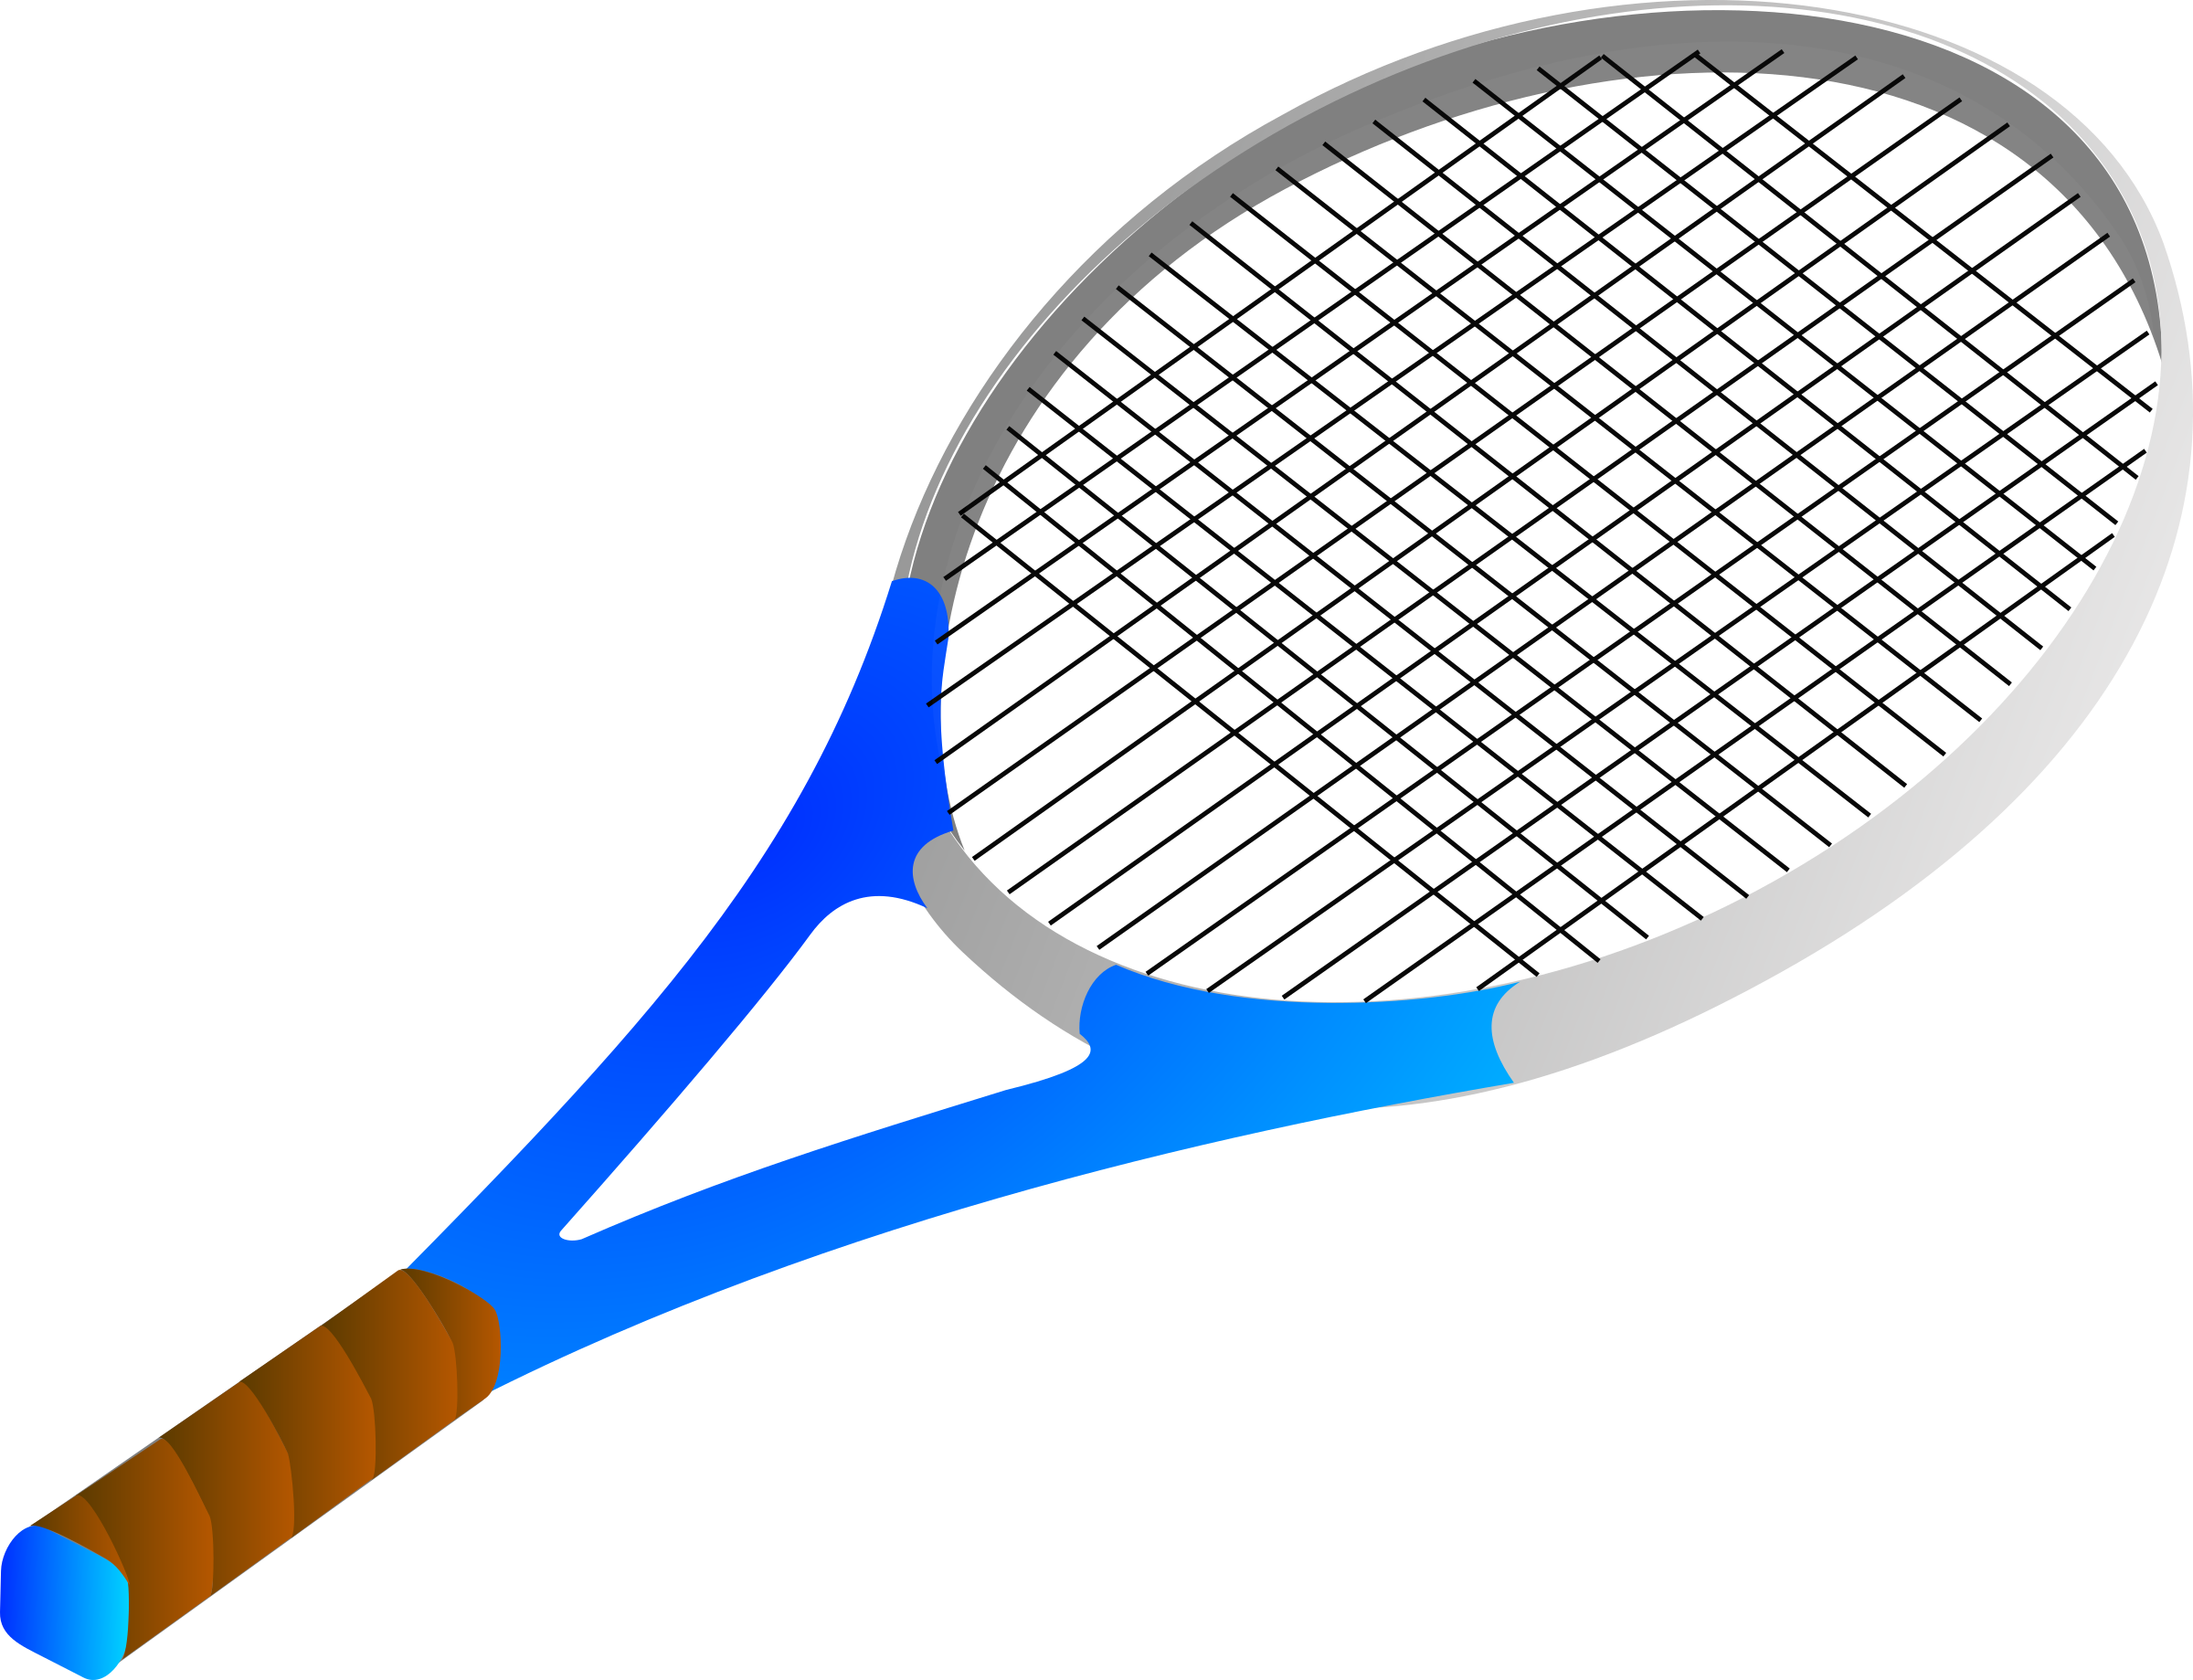 Tennis Racket Png Image Tennis Racket Lawn Tennis Rackets